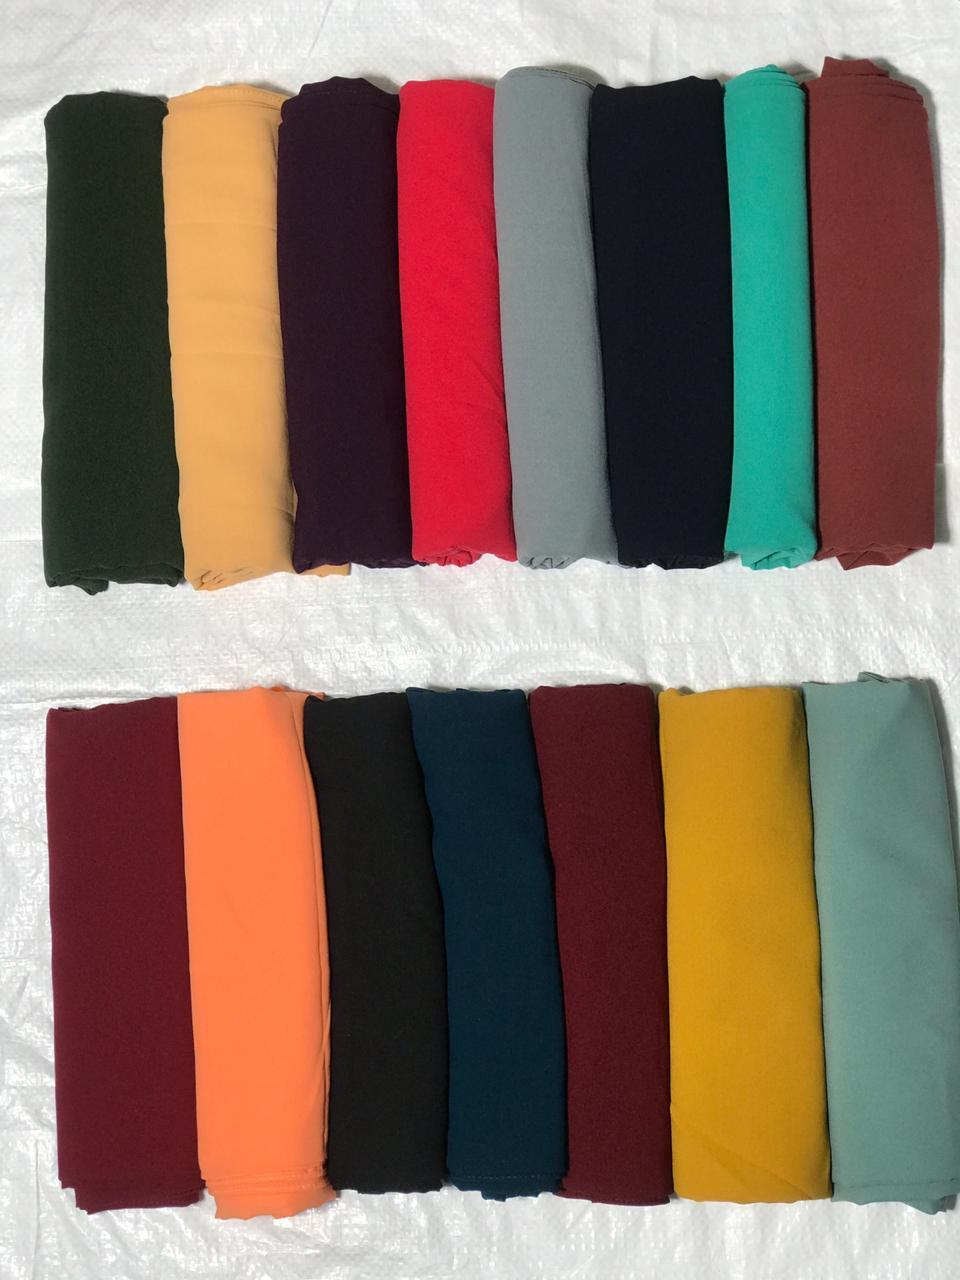 Hijab shawls available